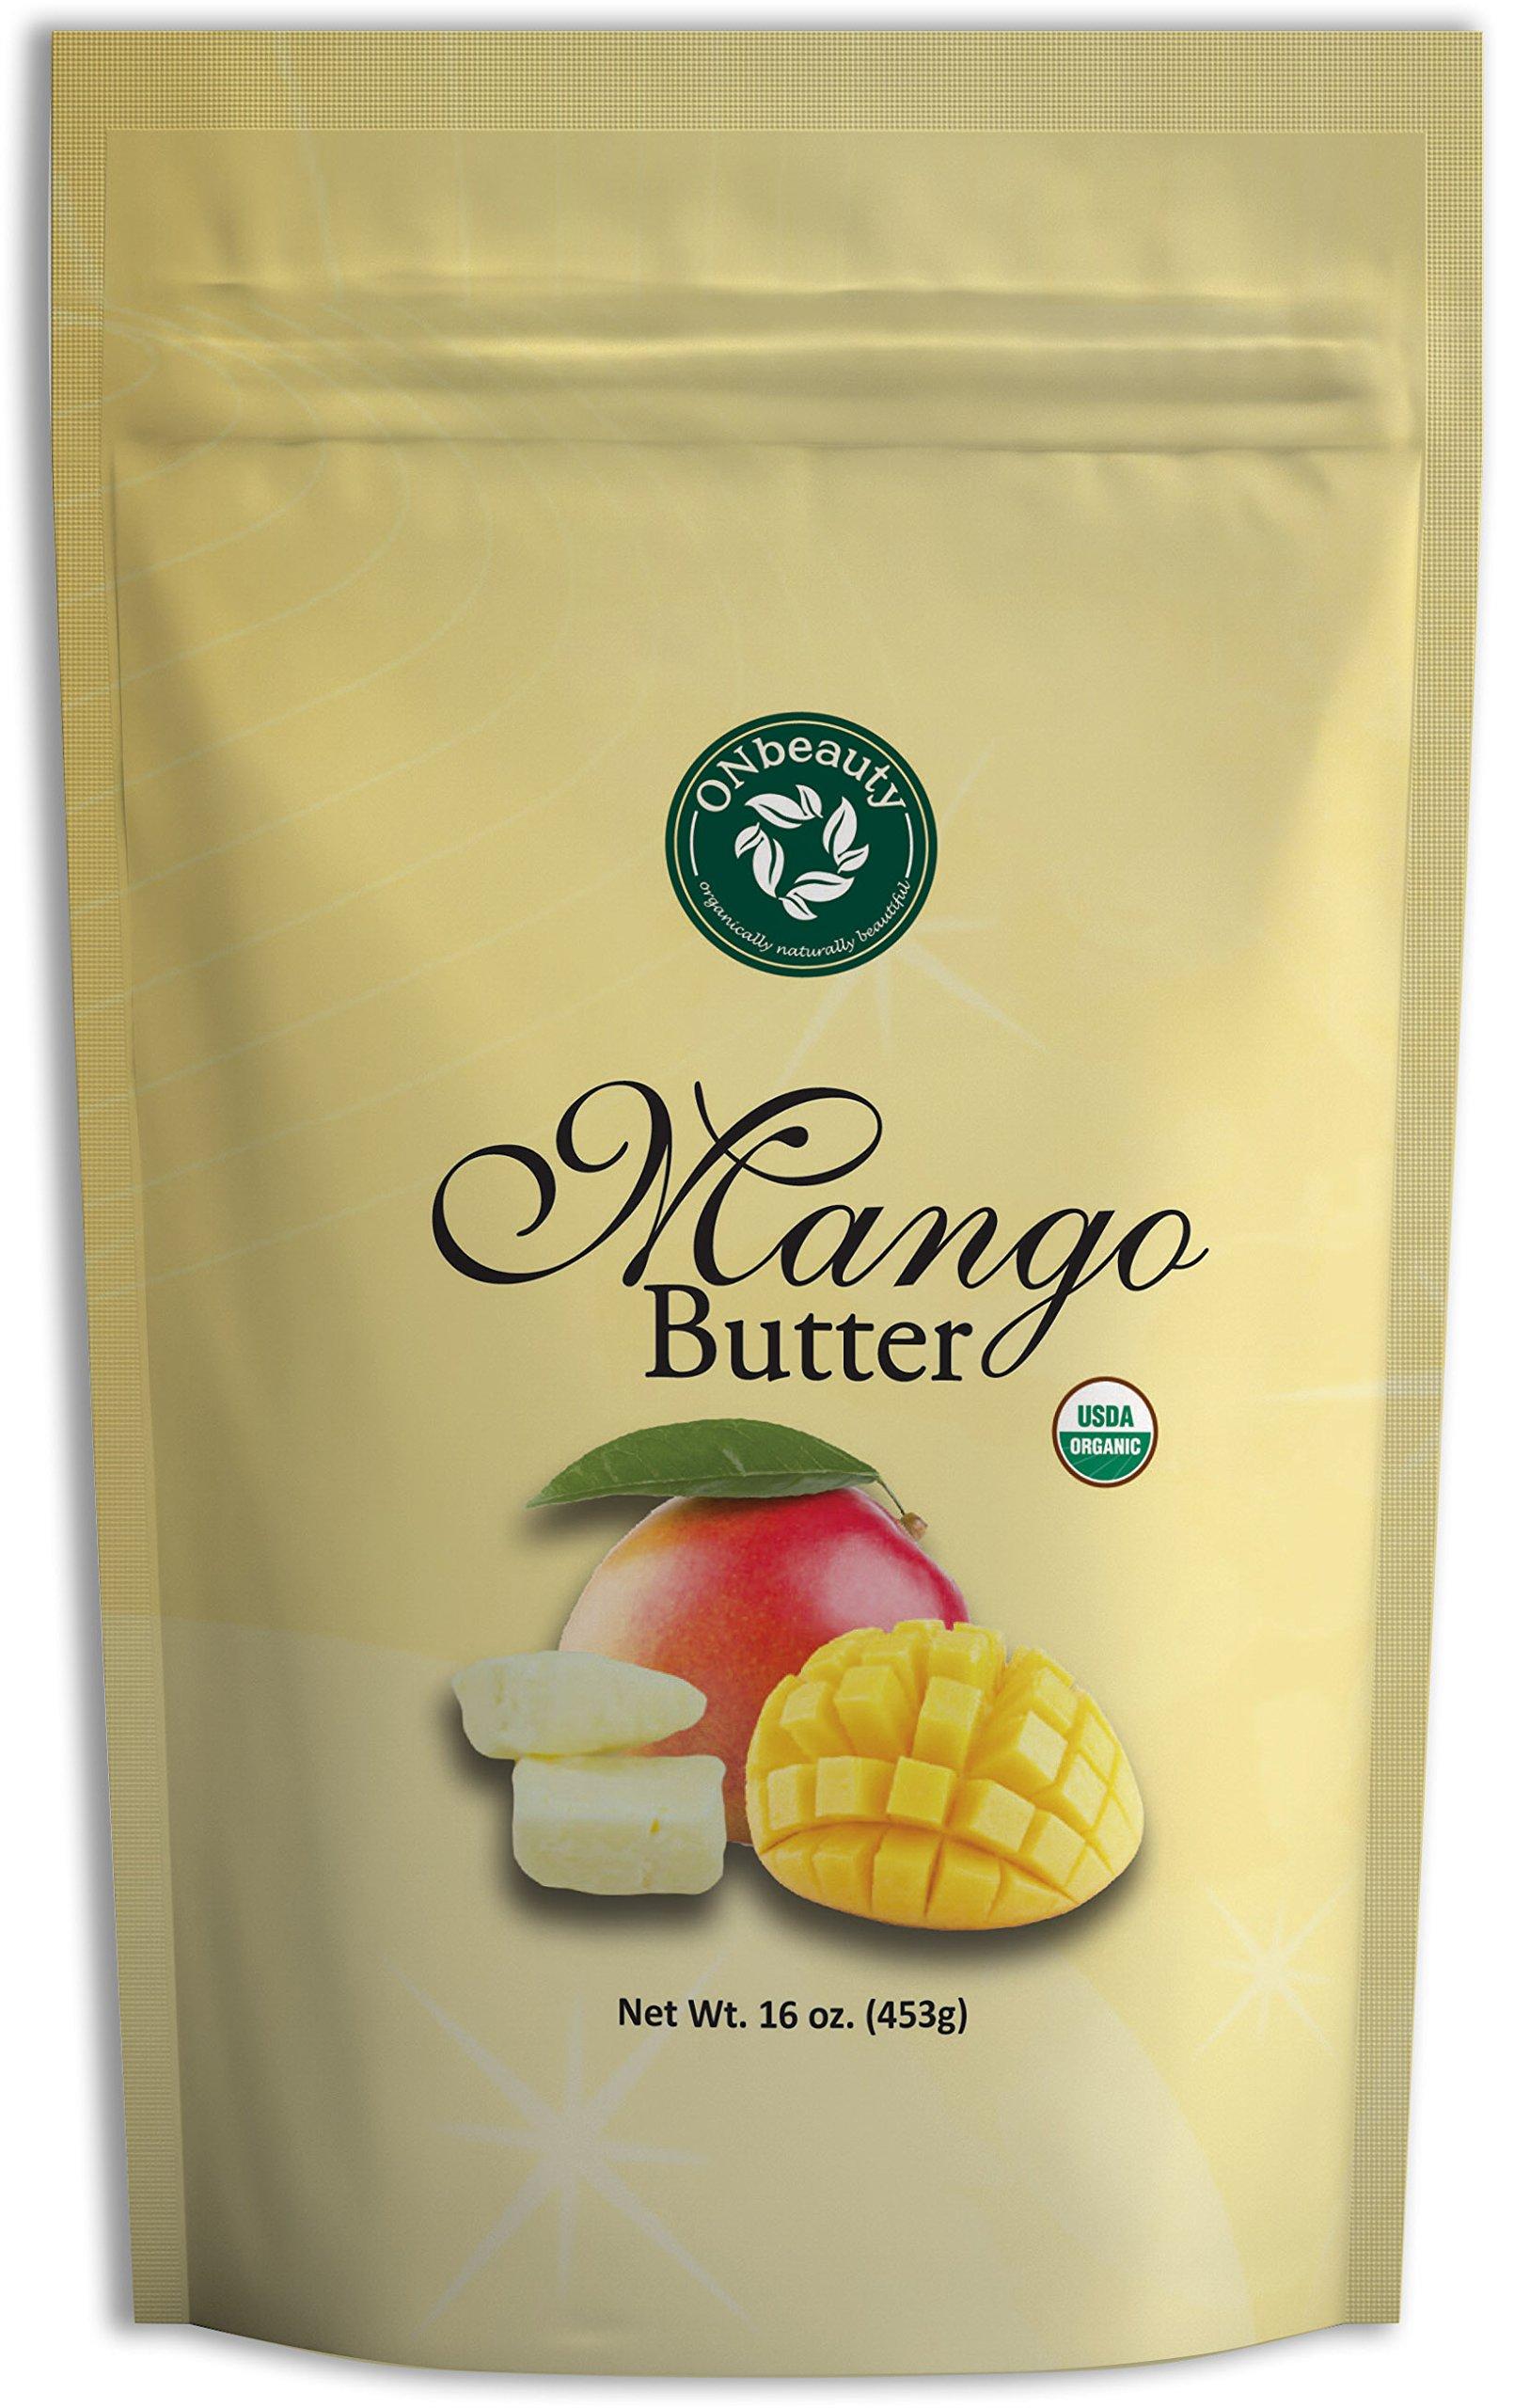 Organic Mango Butter - USDA Certified, Pure, Natural, DIY Skin/Hair Care, Unscented (16 oz)